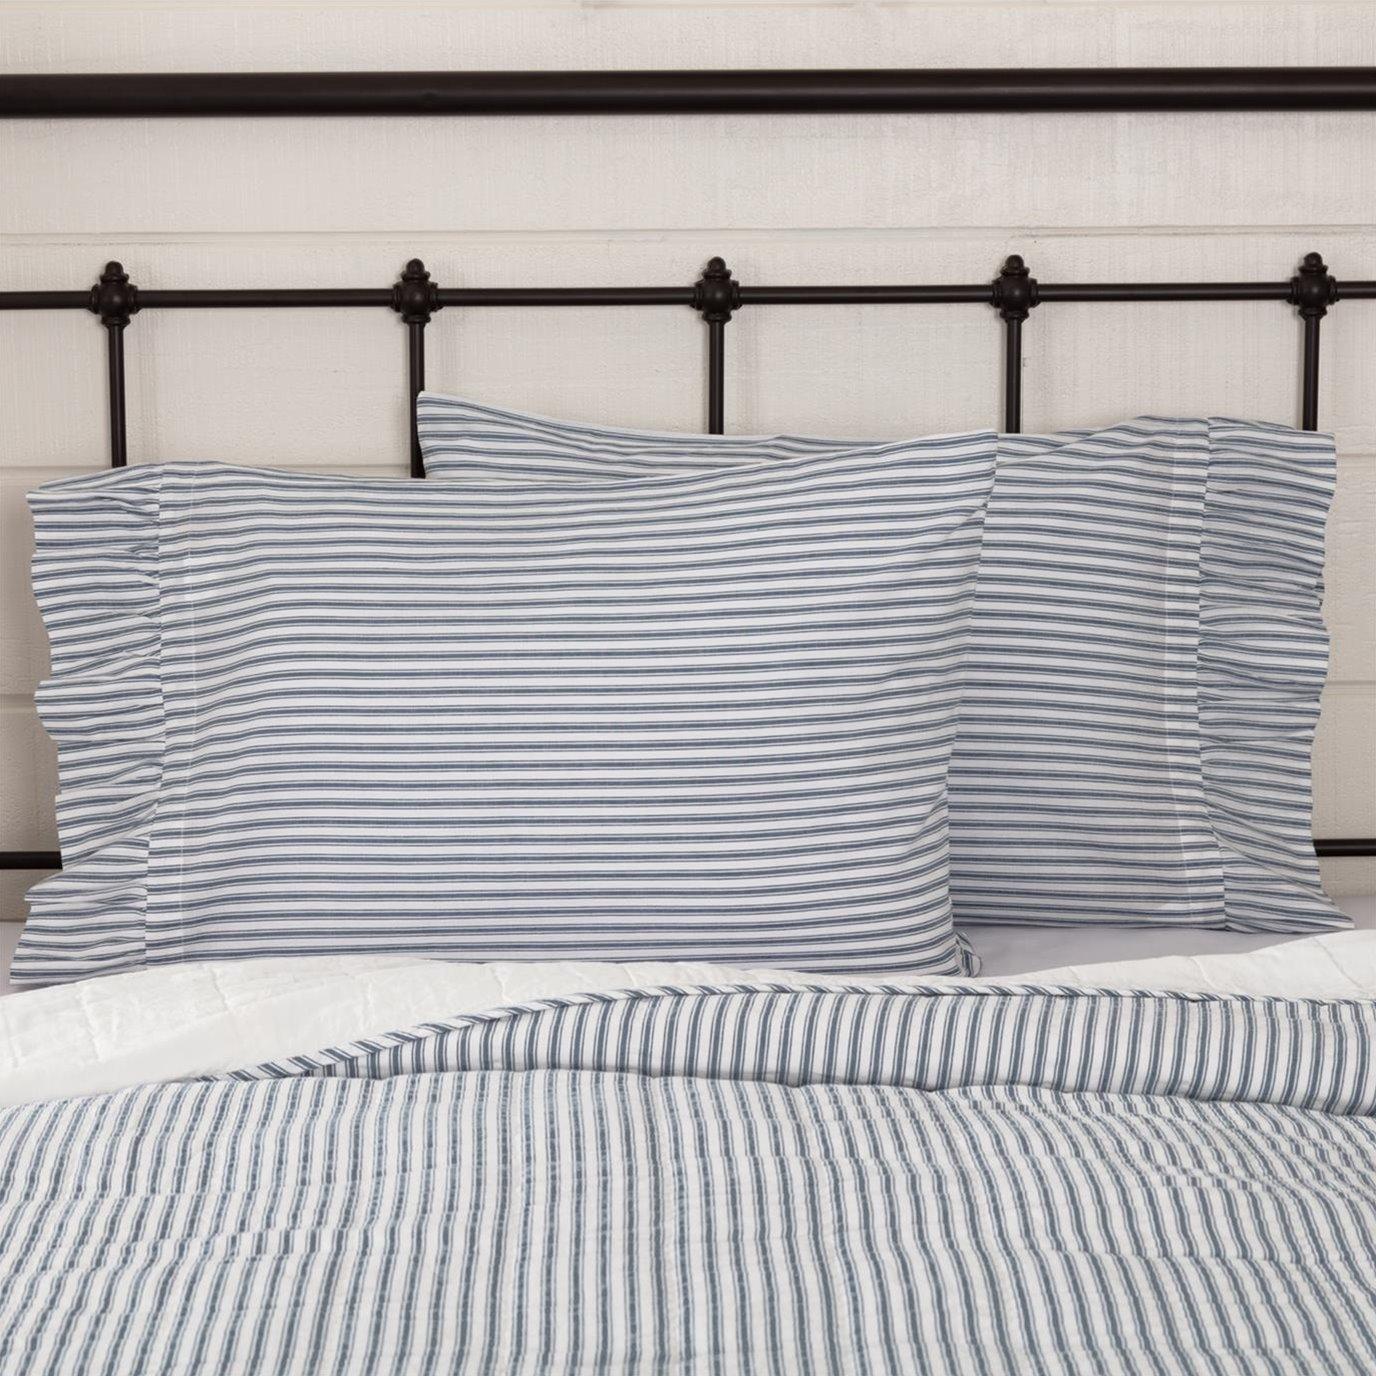 Sawyer Mill Blue Ticking Stripe Ruffled Standard Pillow Case Set of 2 21x30